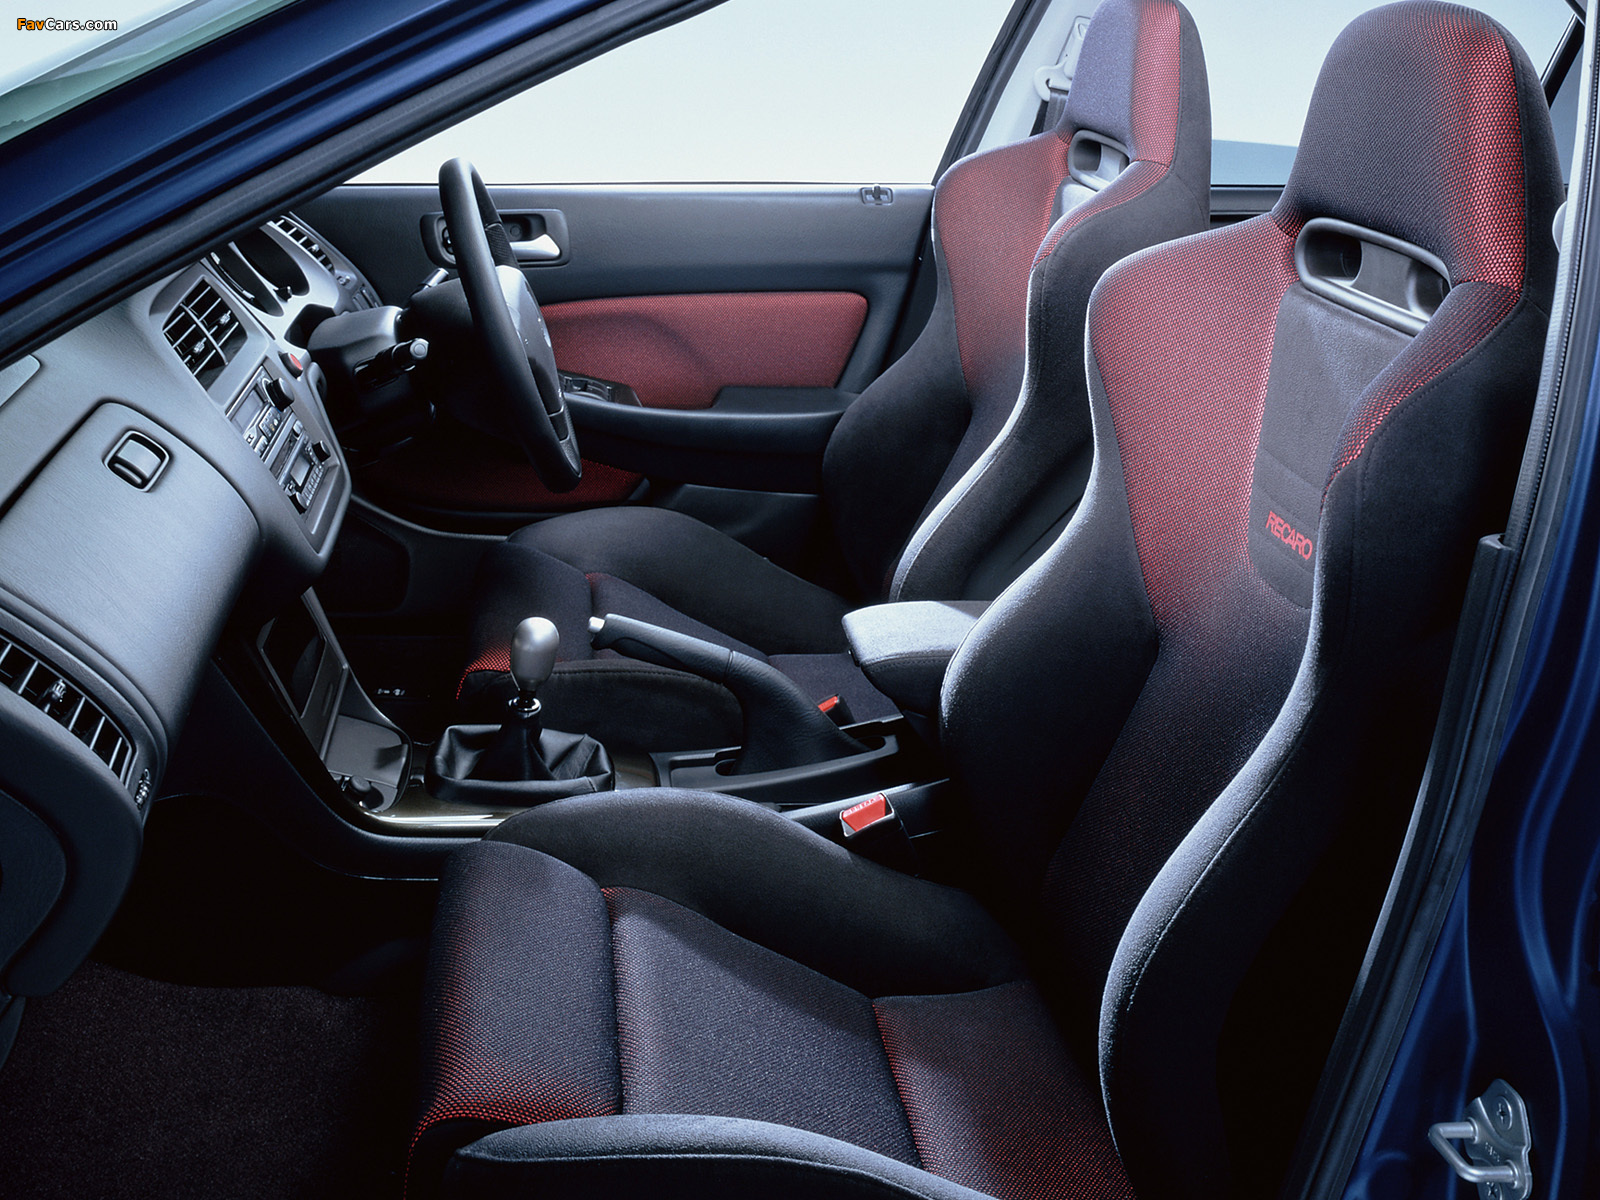 2000 Honda Accord >> Honda Accord Euro R (CL1) 2000–02 images (1600x1200)